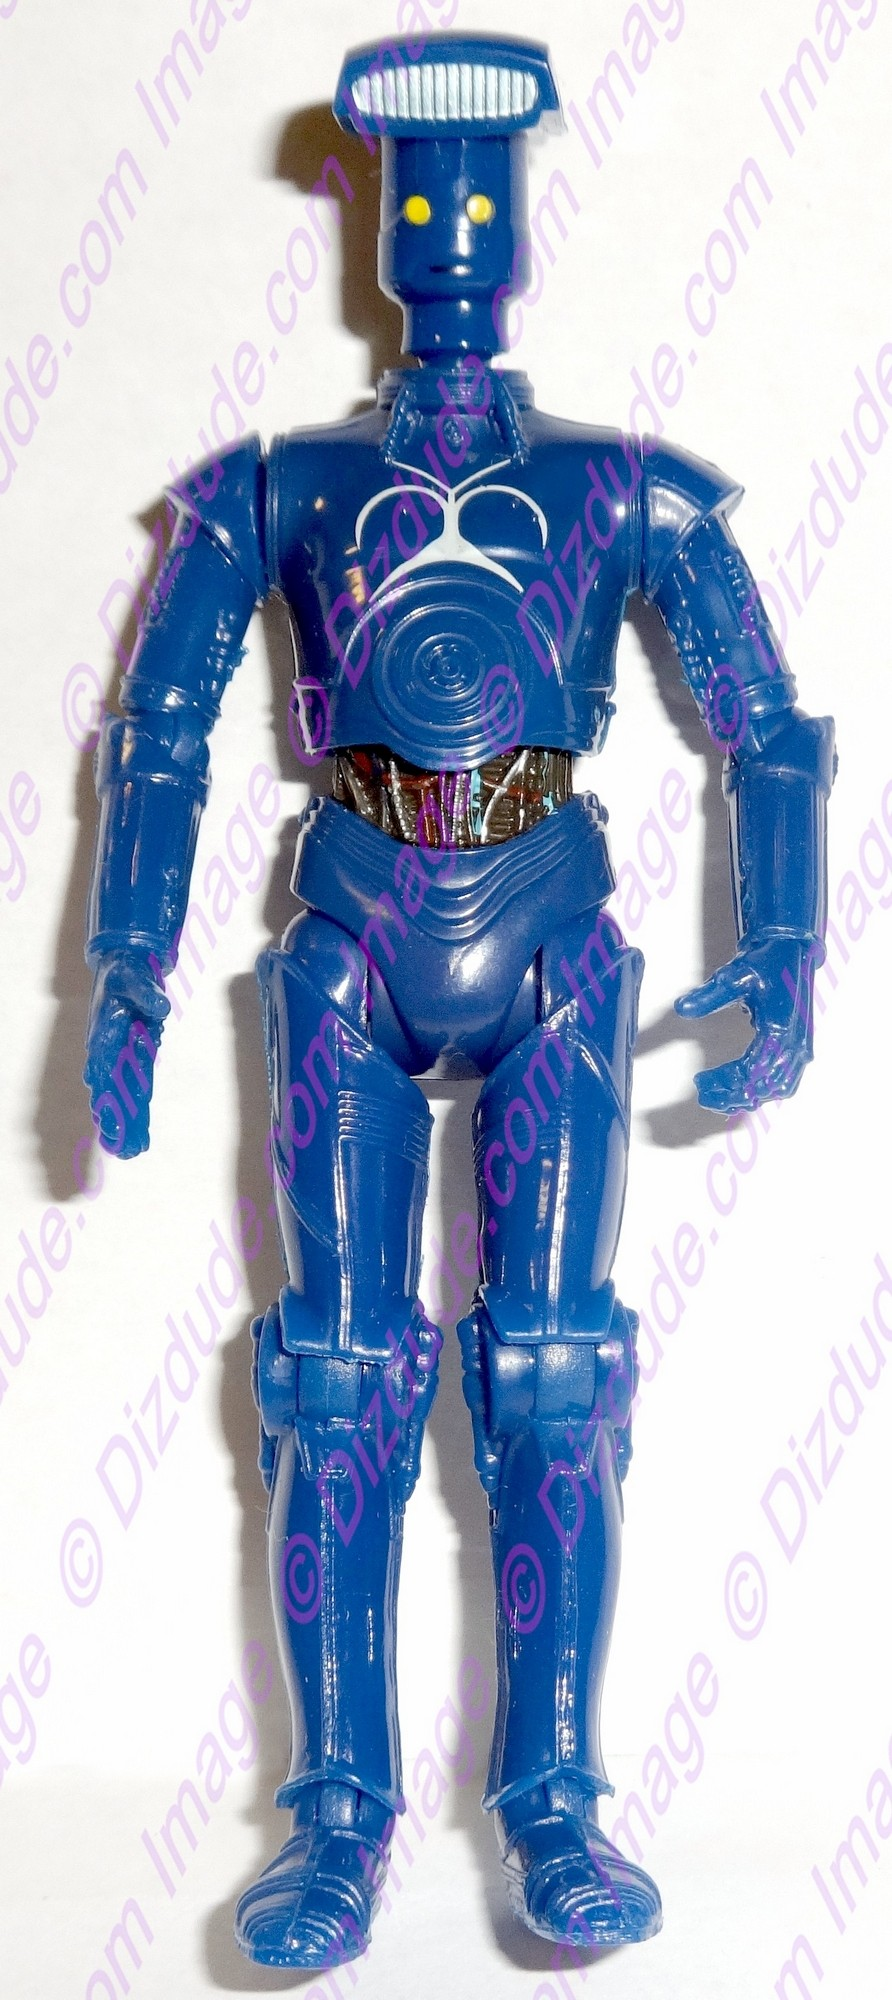 Blue Vender Protocol Droid from Disney Star Wars Build-A-Droid Factory © Dizdude.com